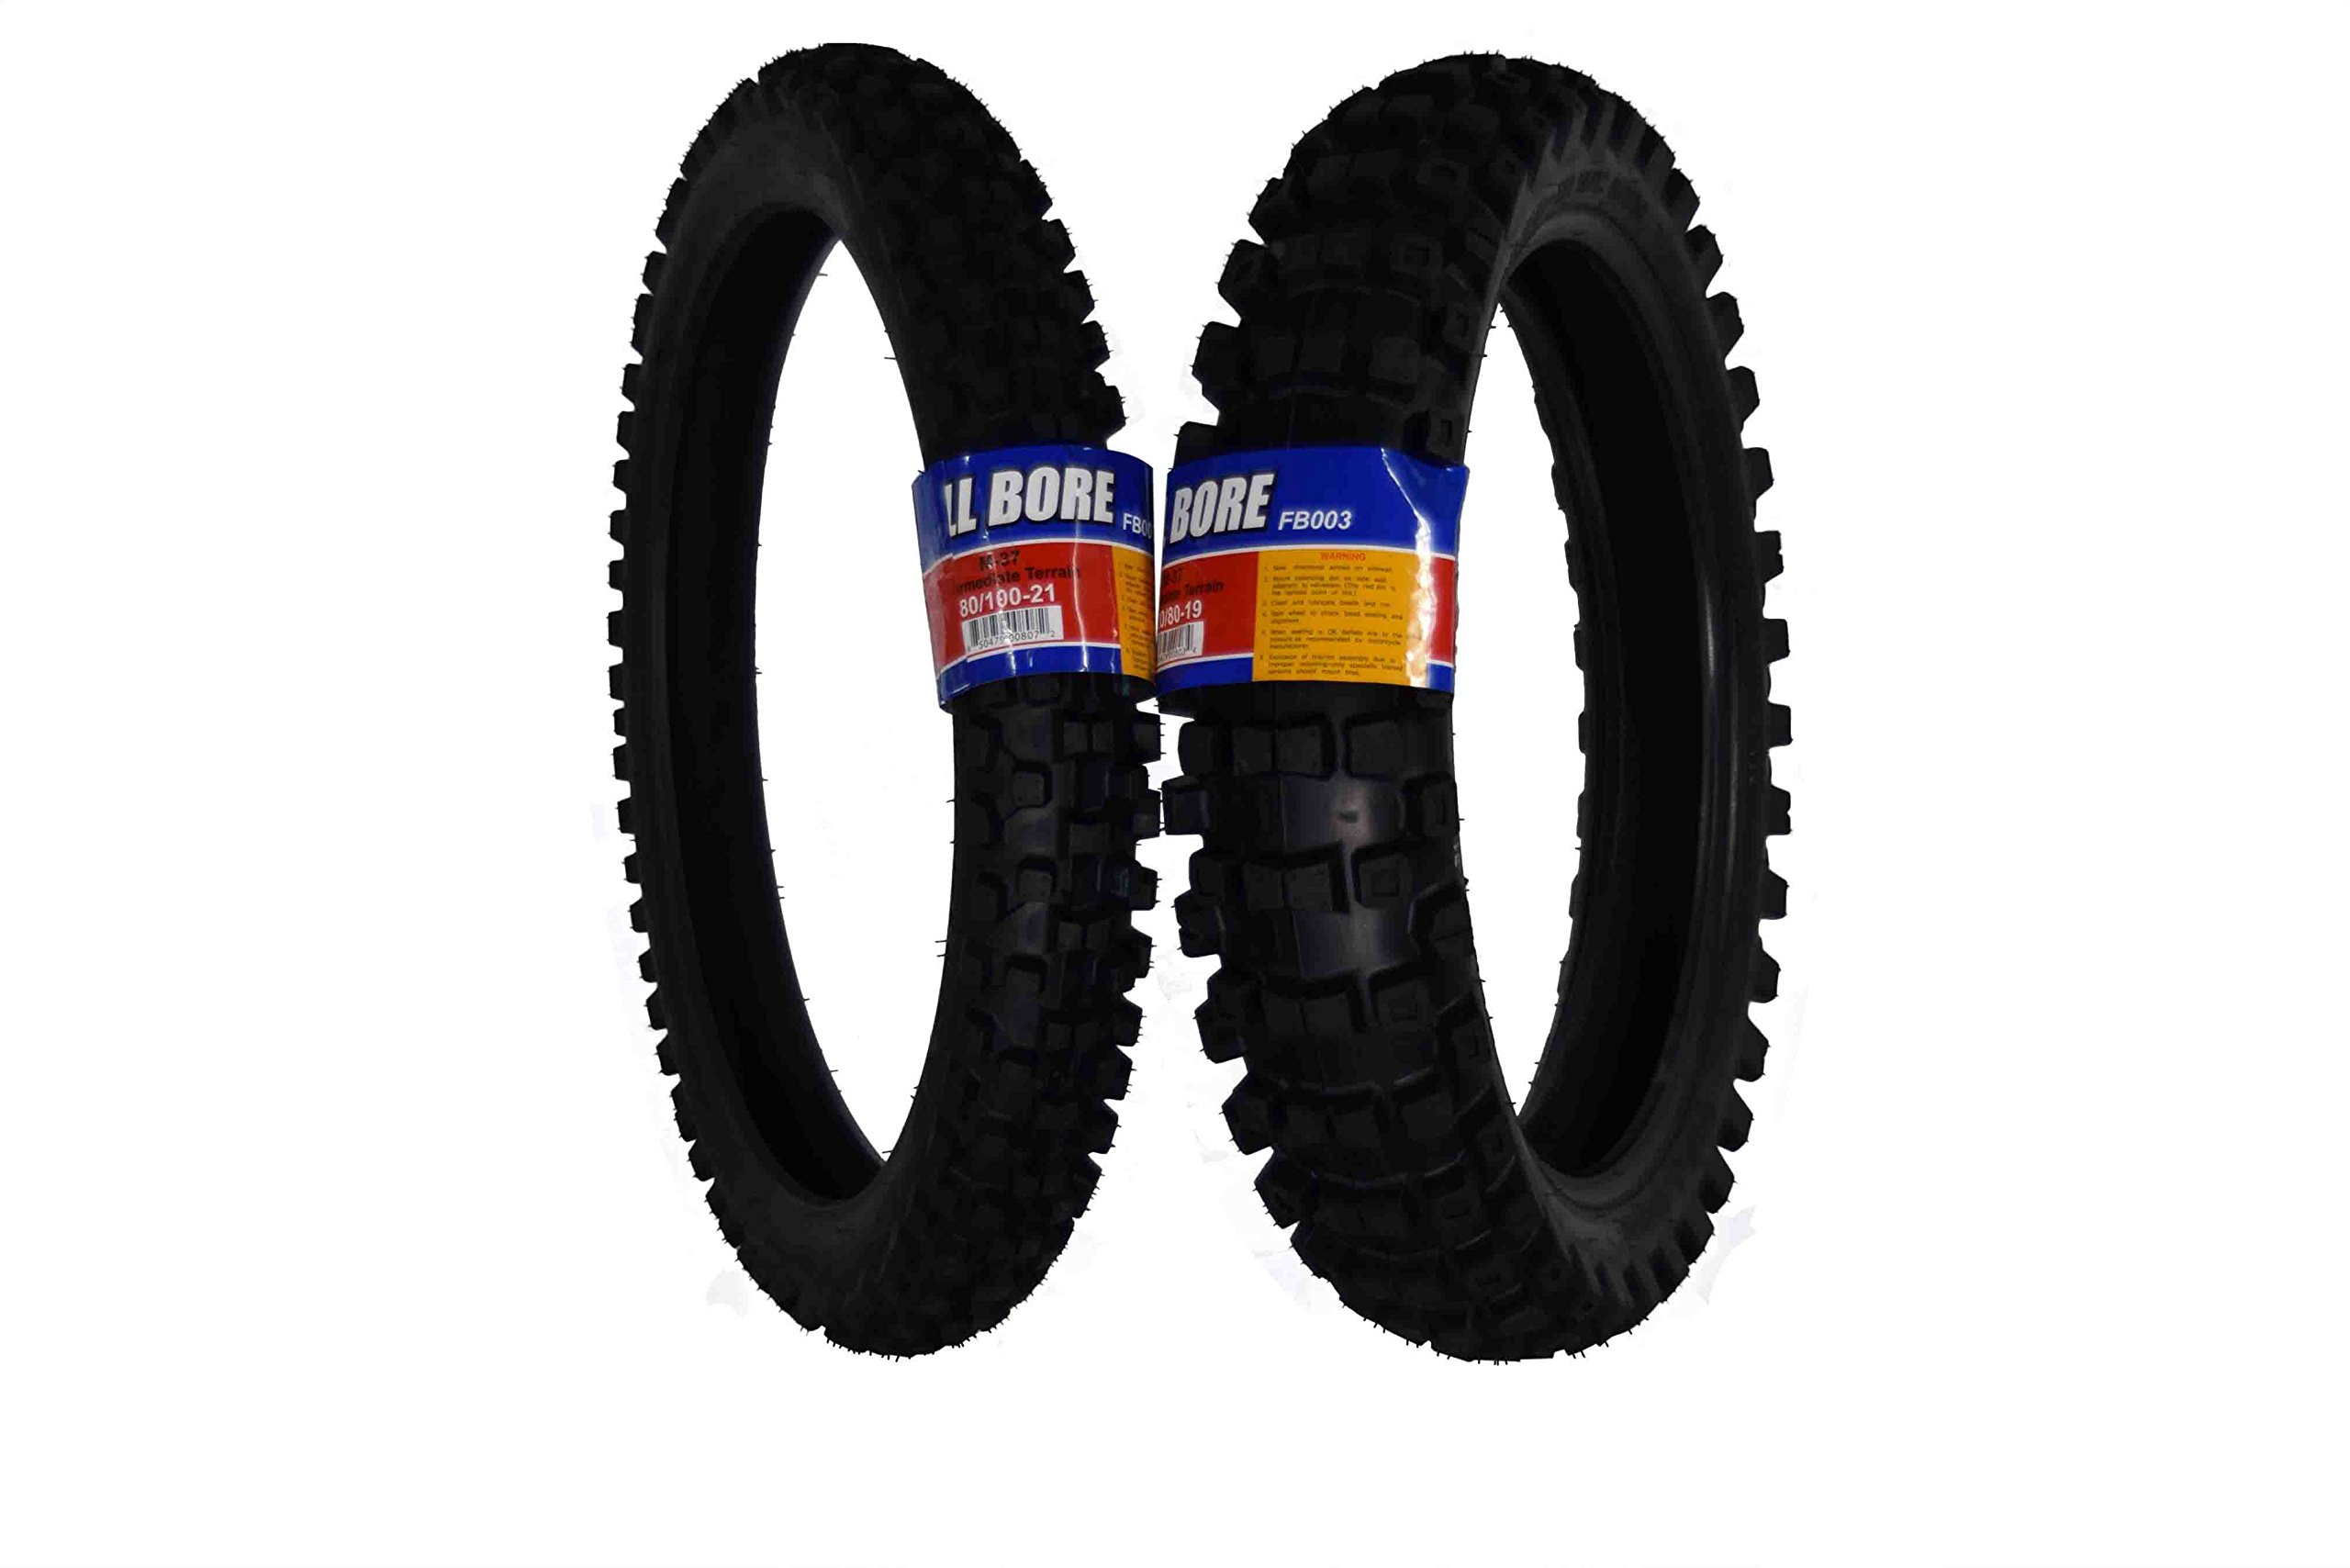 Full Bore 80/100-21 F 120/80-19 R M37 Intermediate Terrain Dirt Bike Tire Set